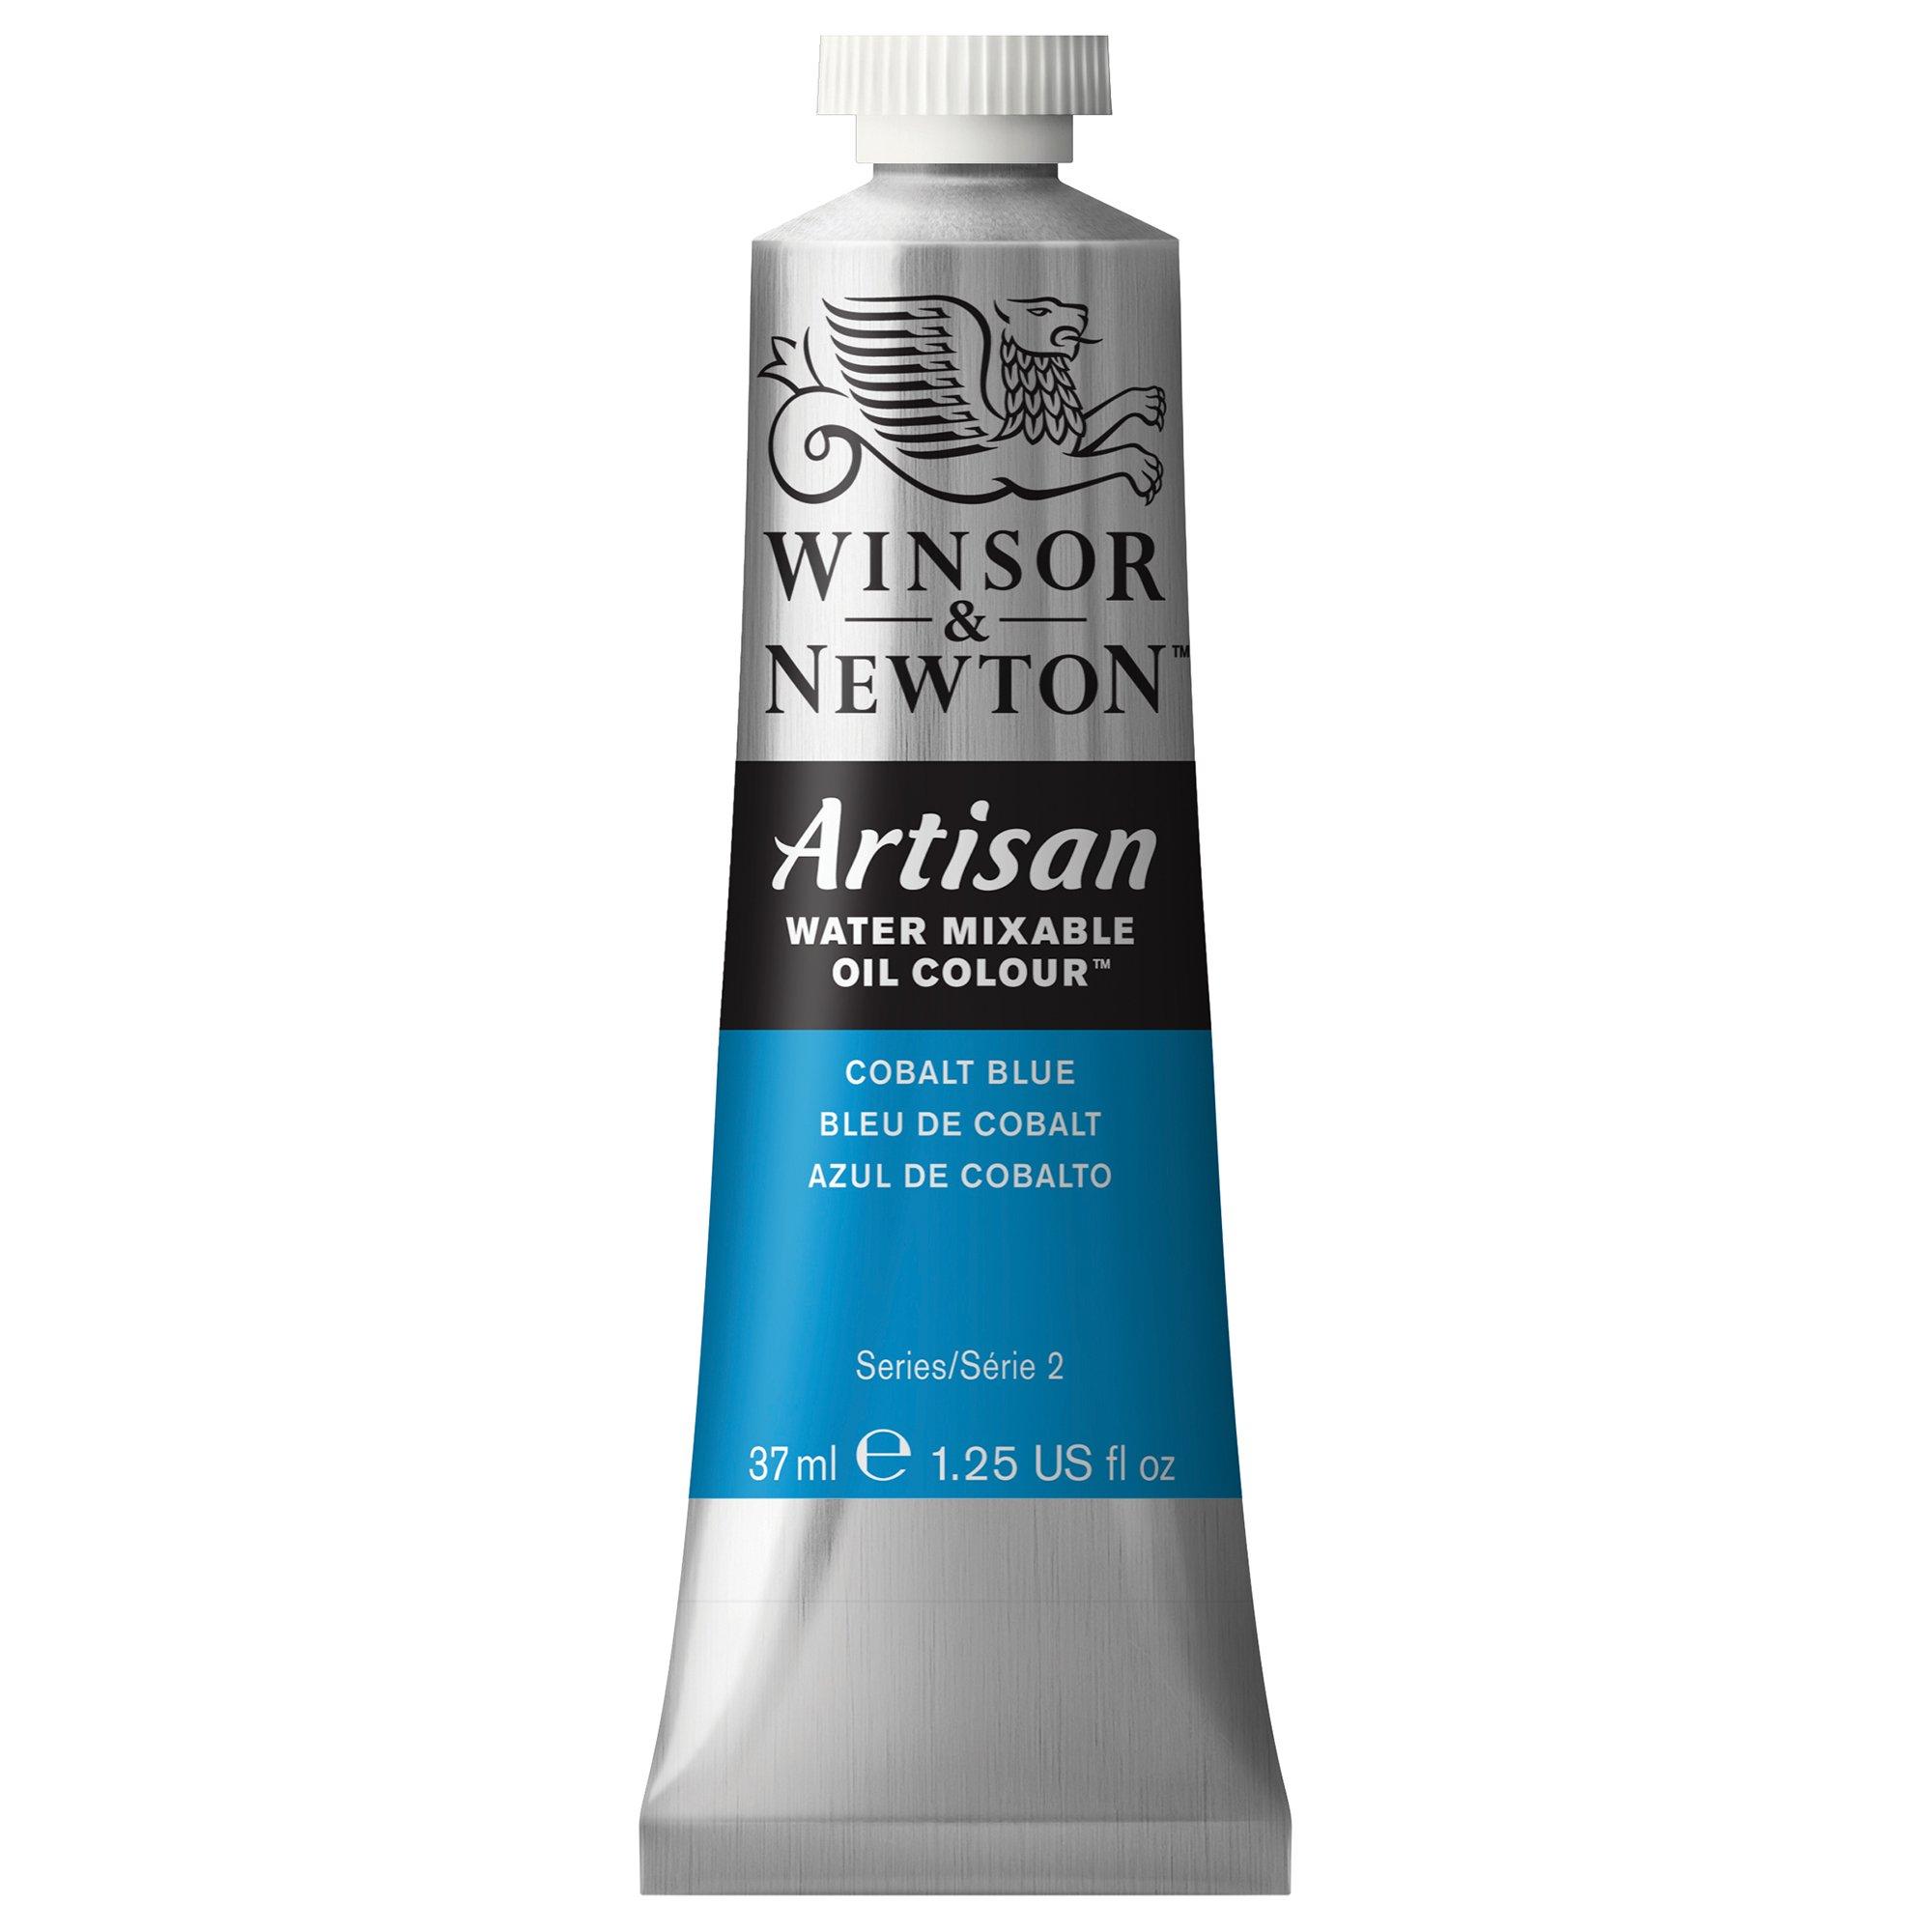 Winsor & Newton Artisan Water Mixable Oil Colour, 37ml Tube, Cobalt Blue